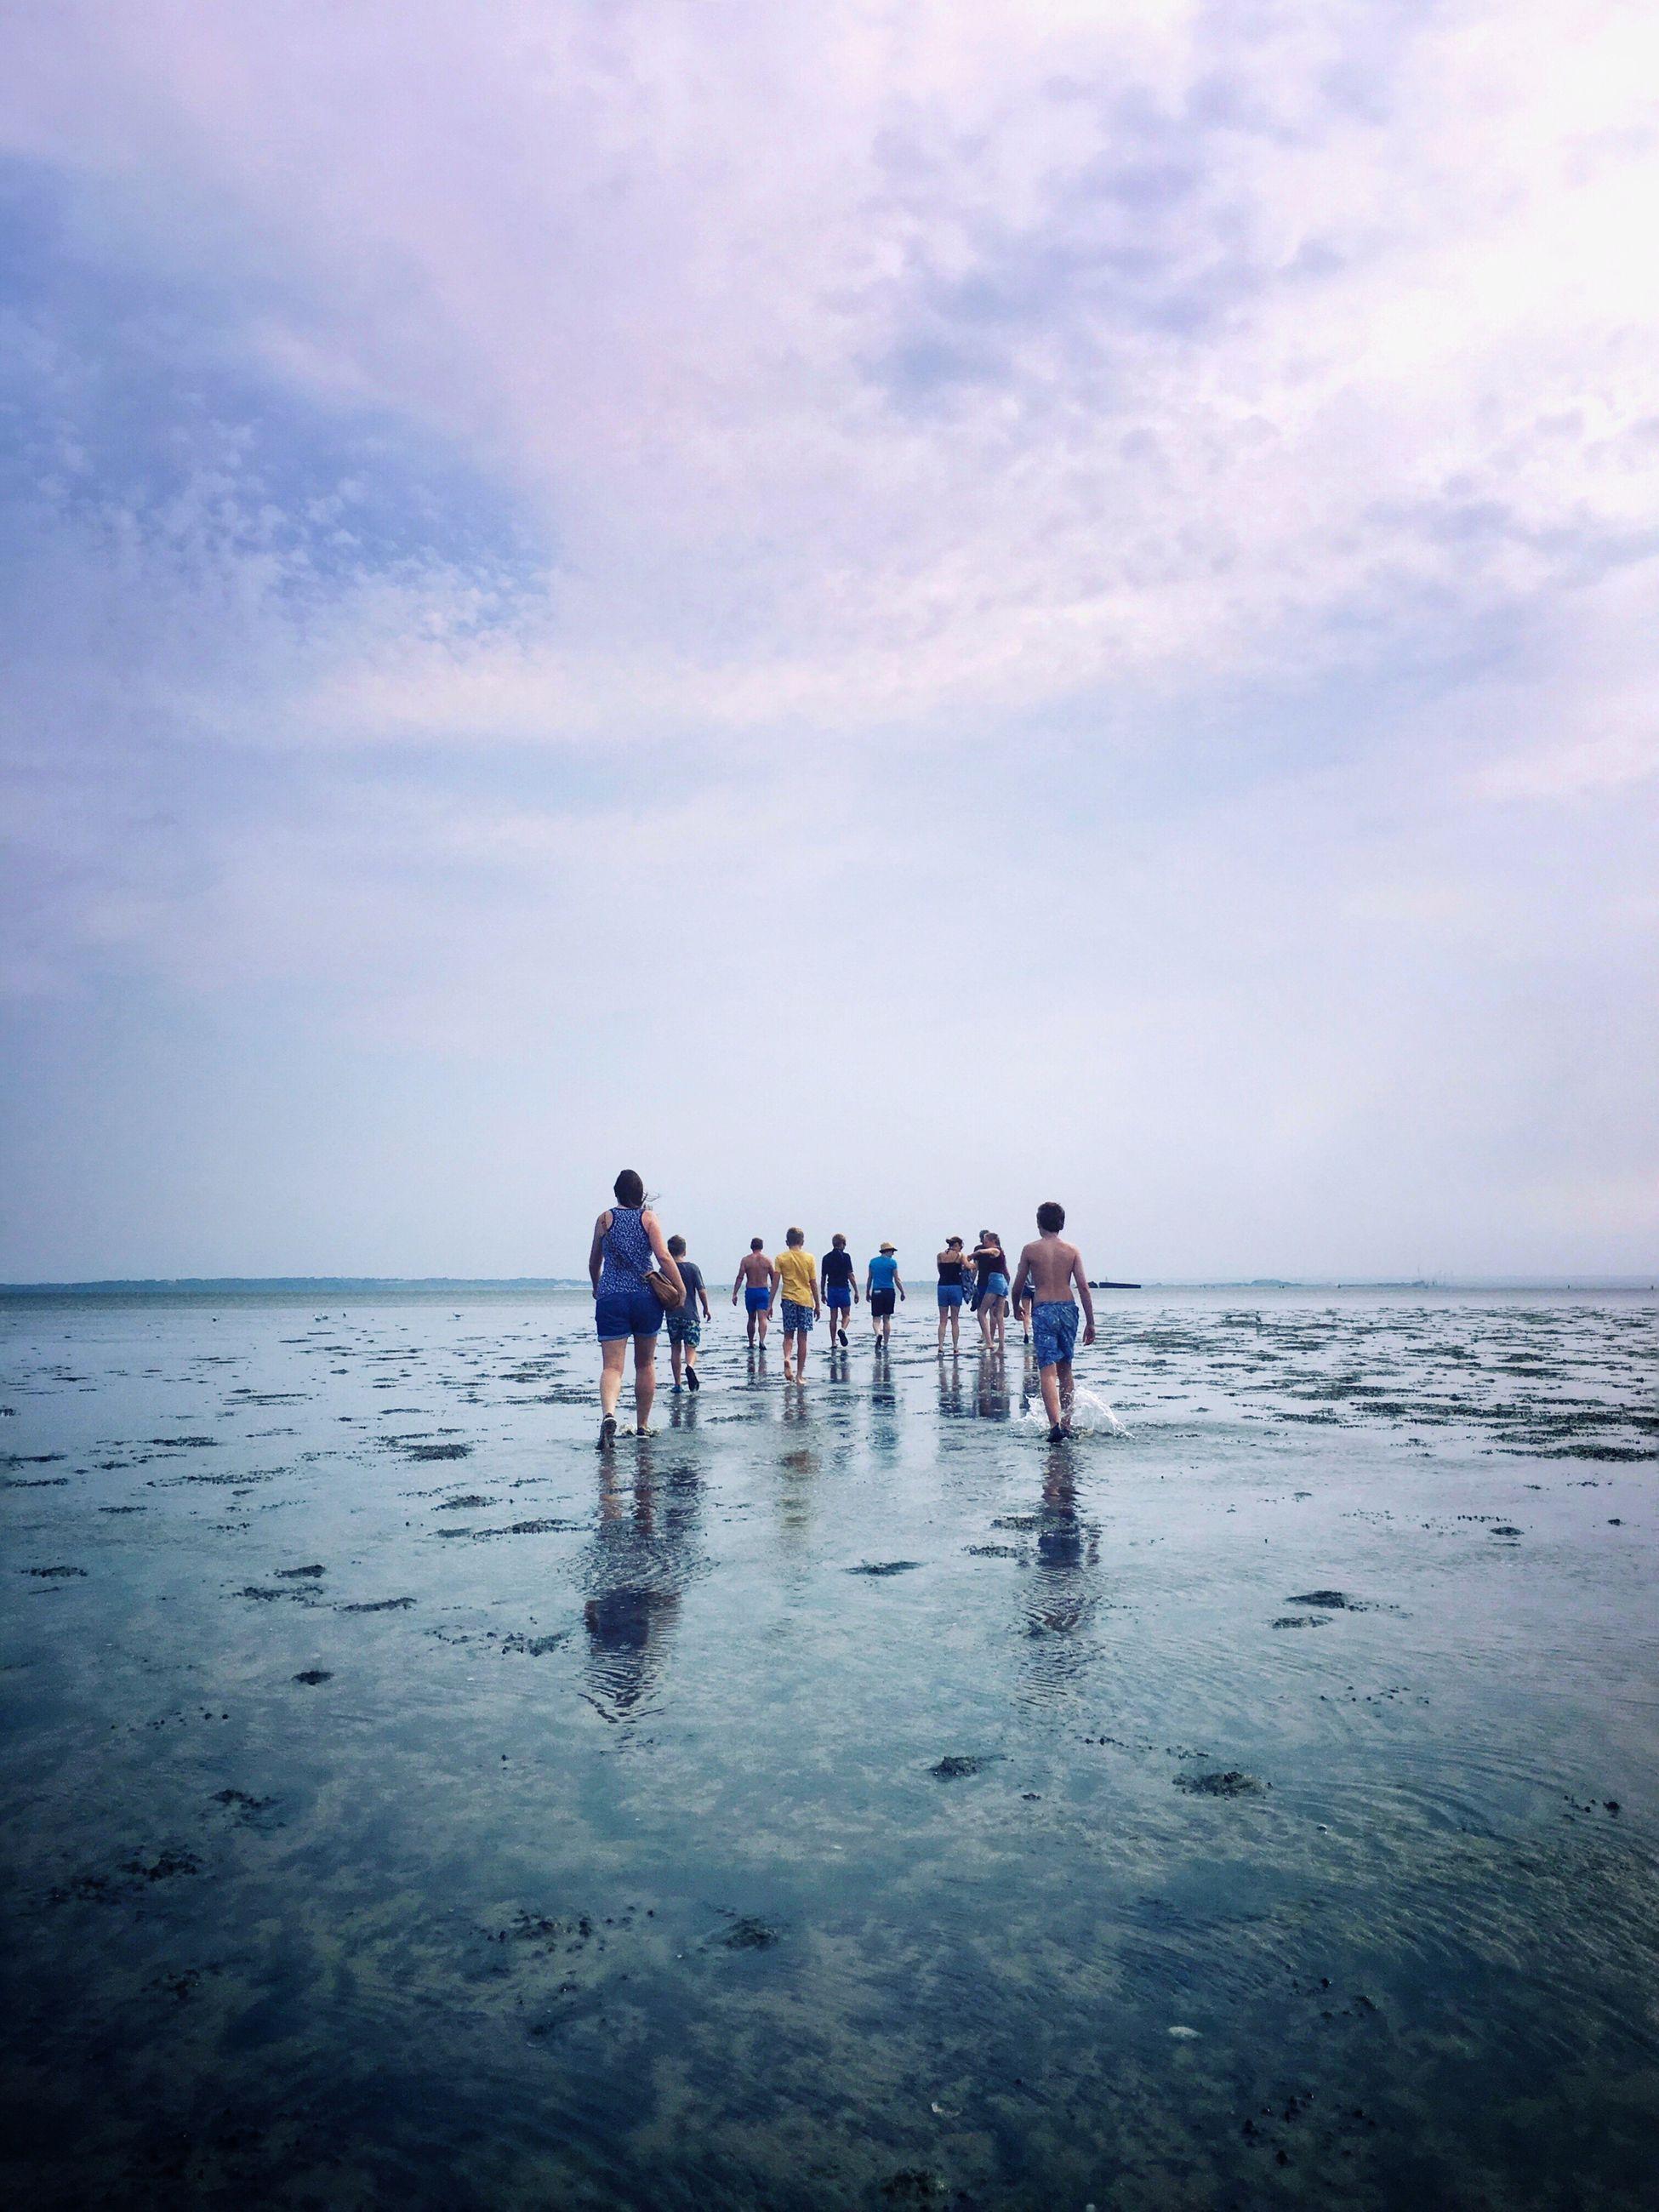 SILHOUETTE OF MAN ON BEACH